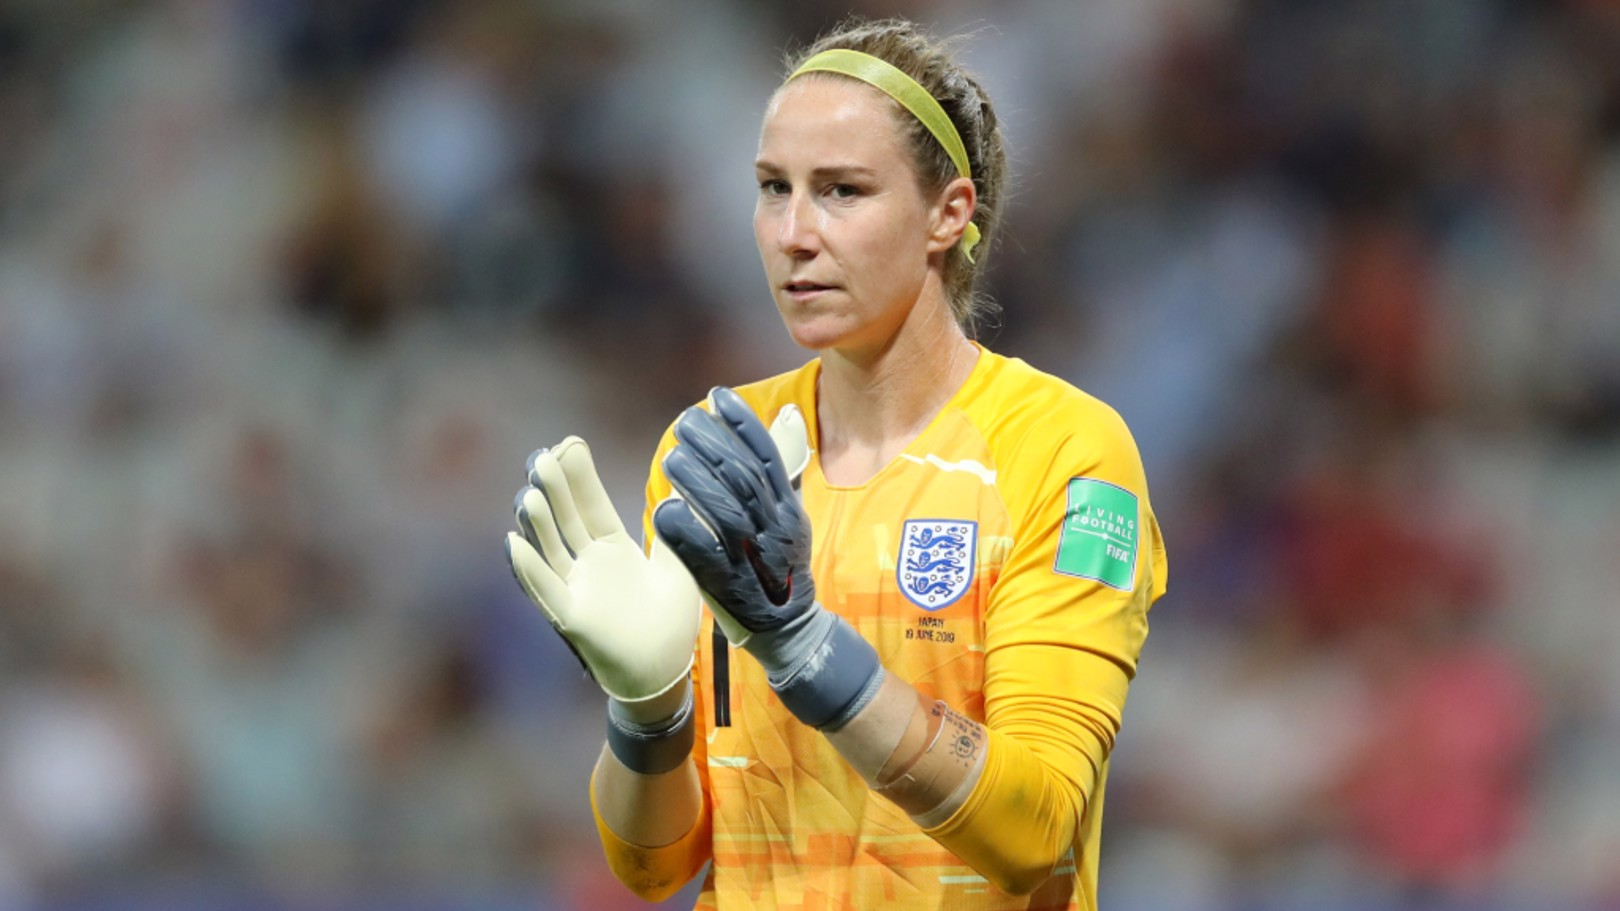 TEAM NEWS: Injury update on City and England goalkeeper Karen Bardsley